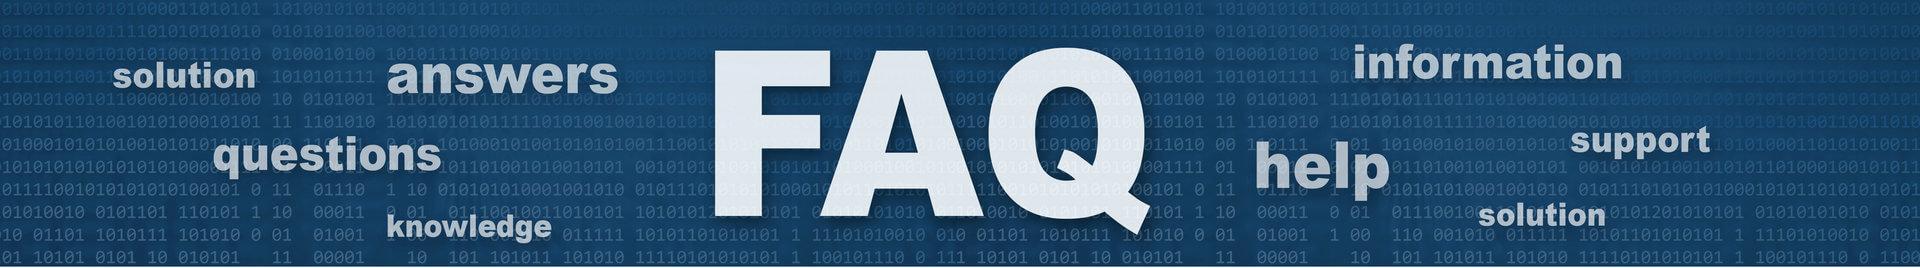 LEADINGLEDTECH FAQ